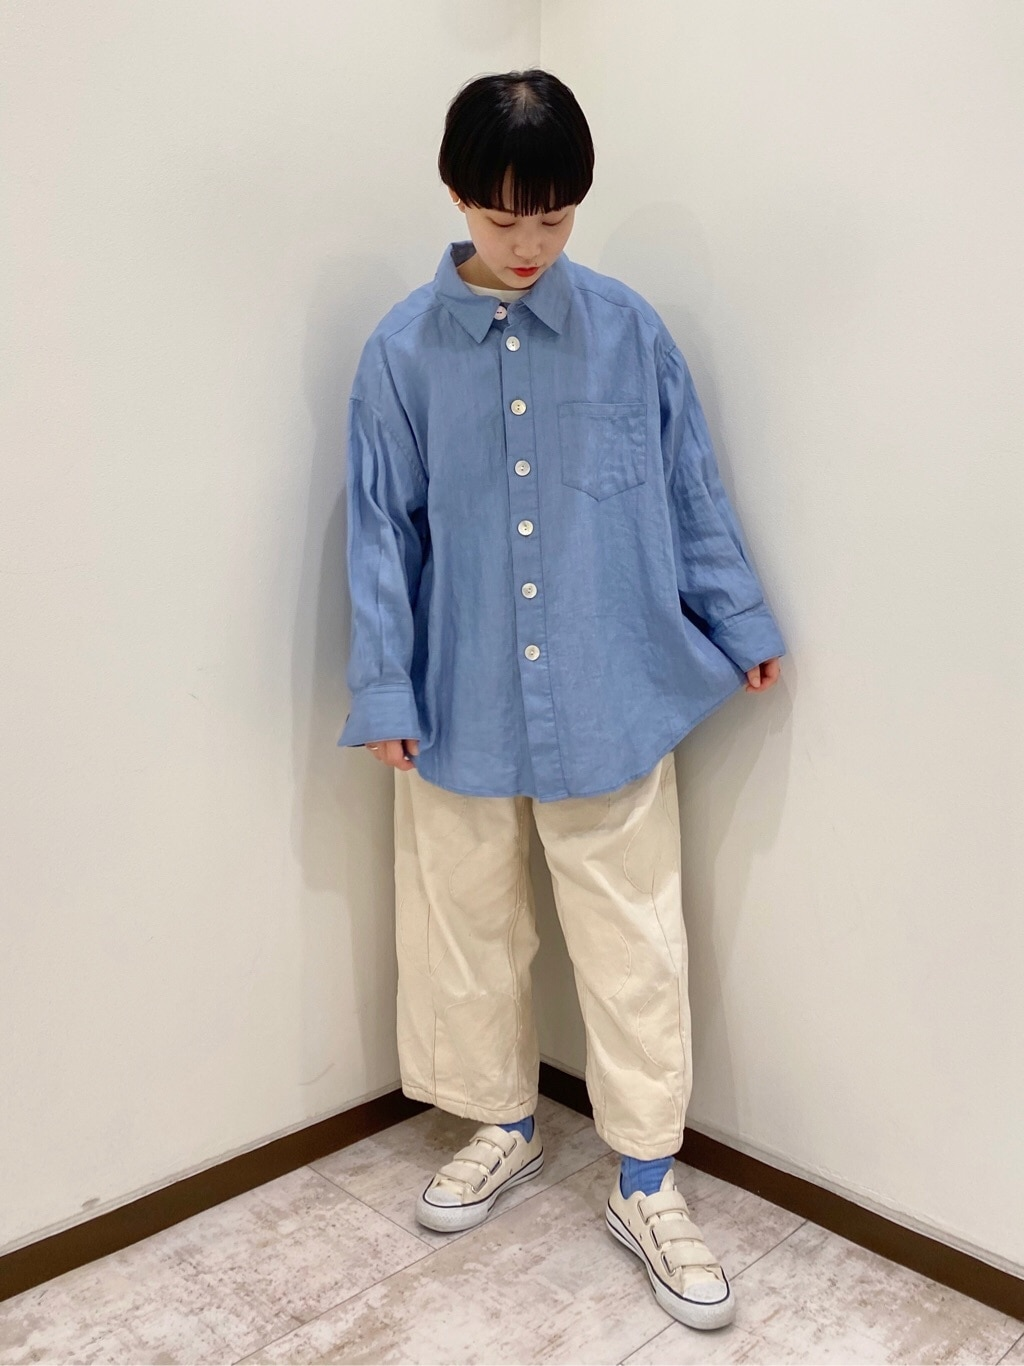 l'atelier du savon 新宿ミロード 身長:159cm 2020.08.03